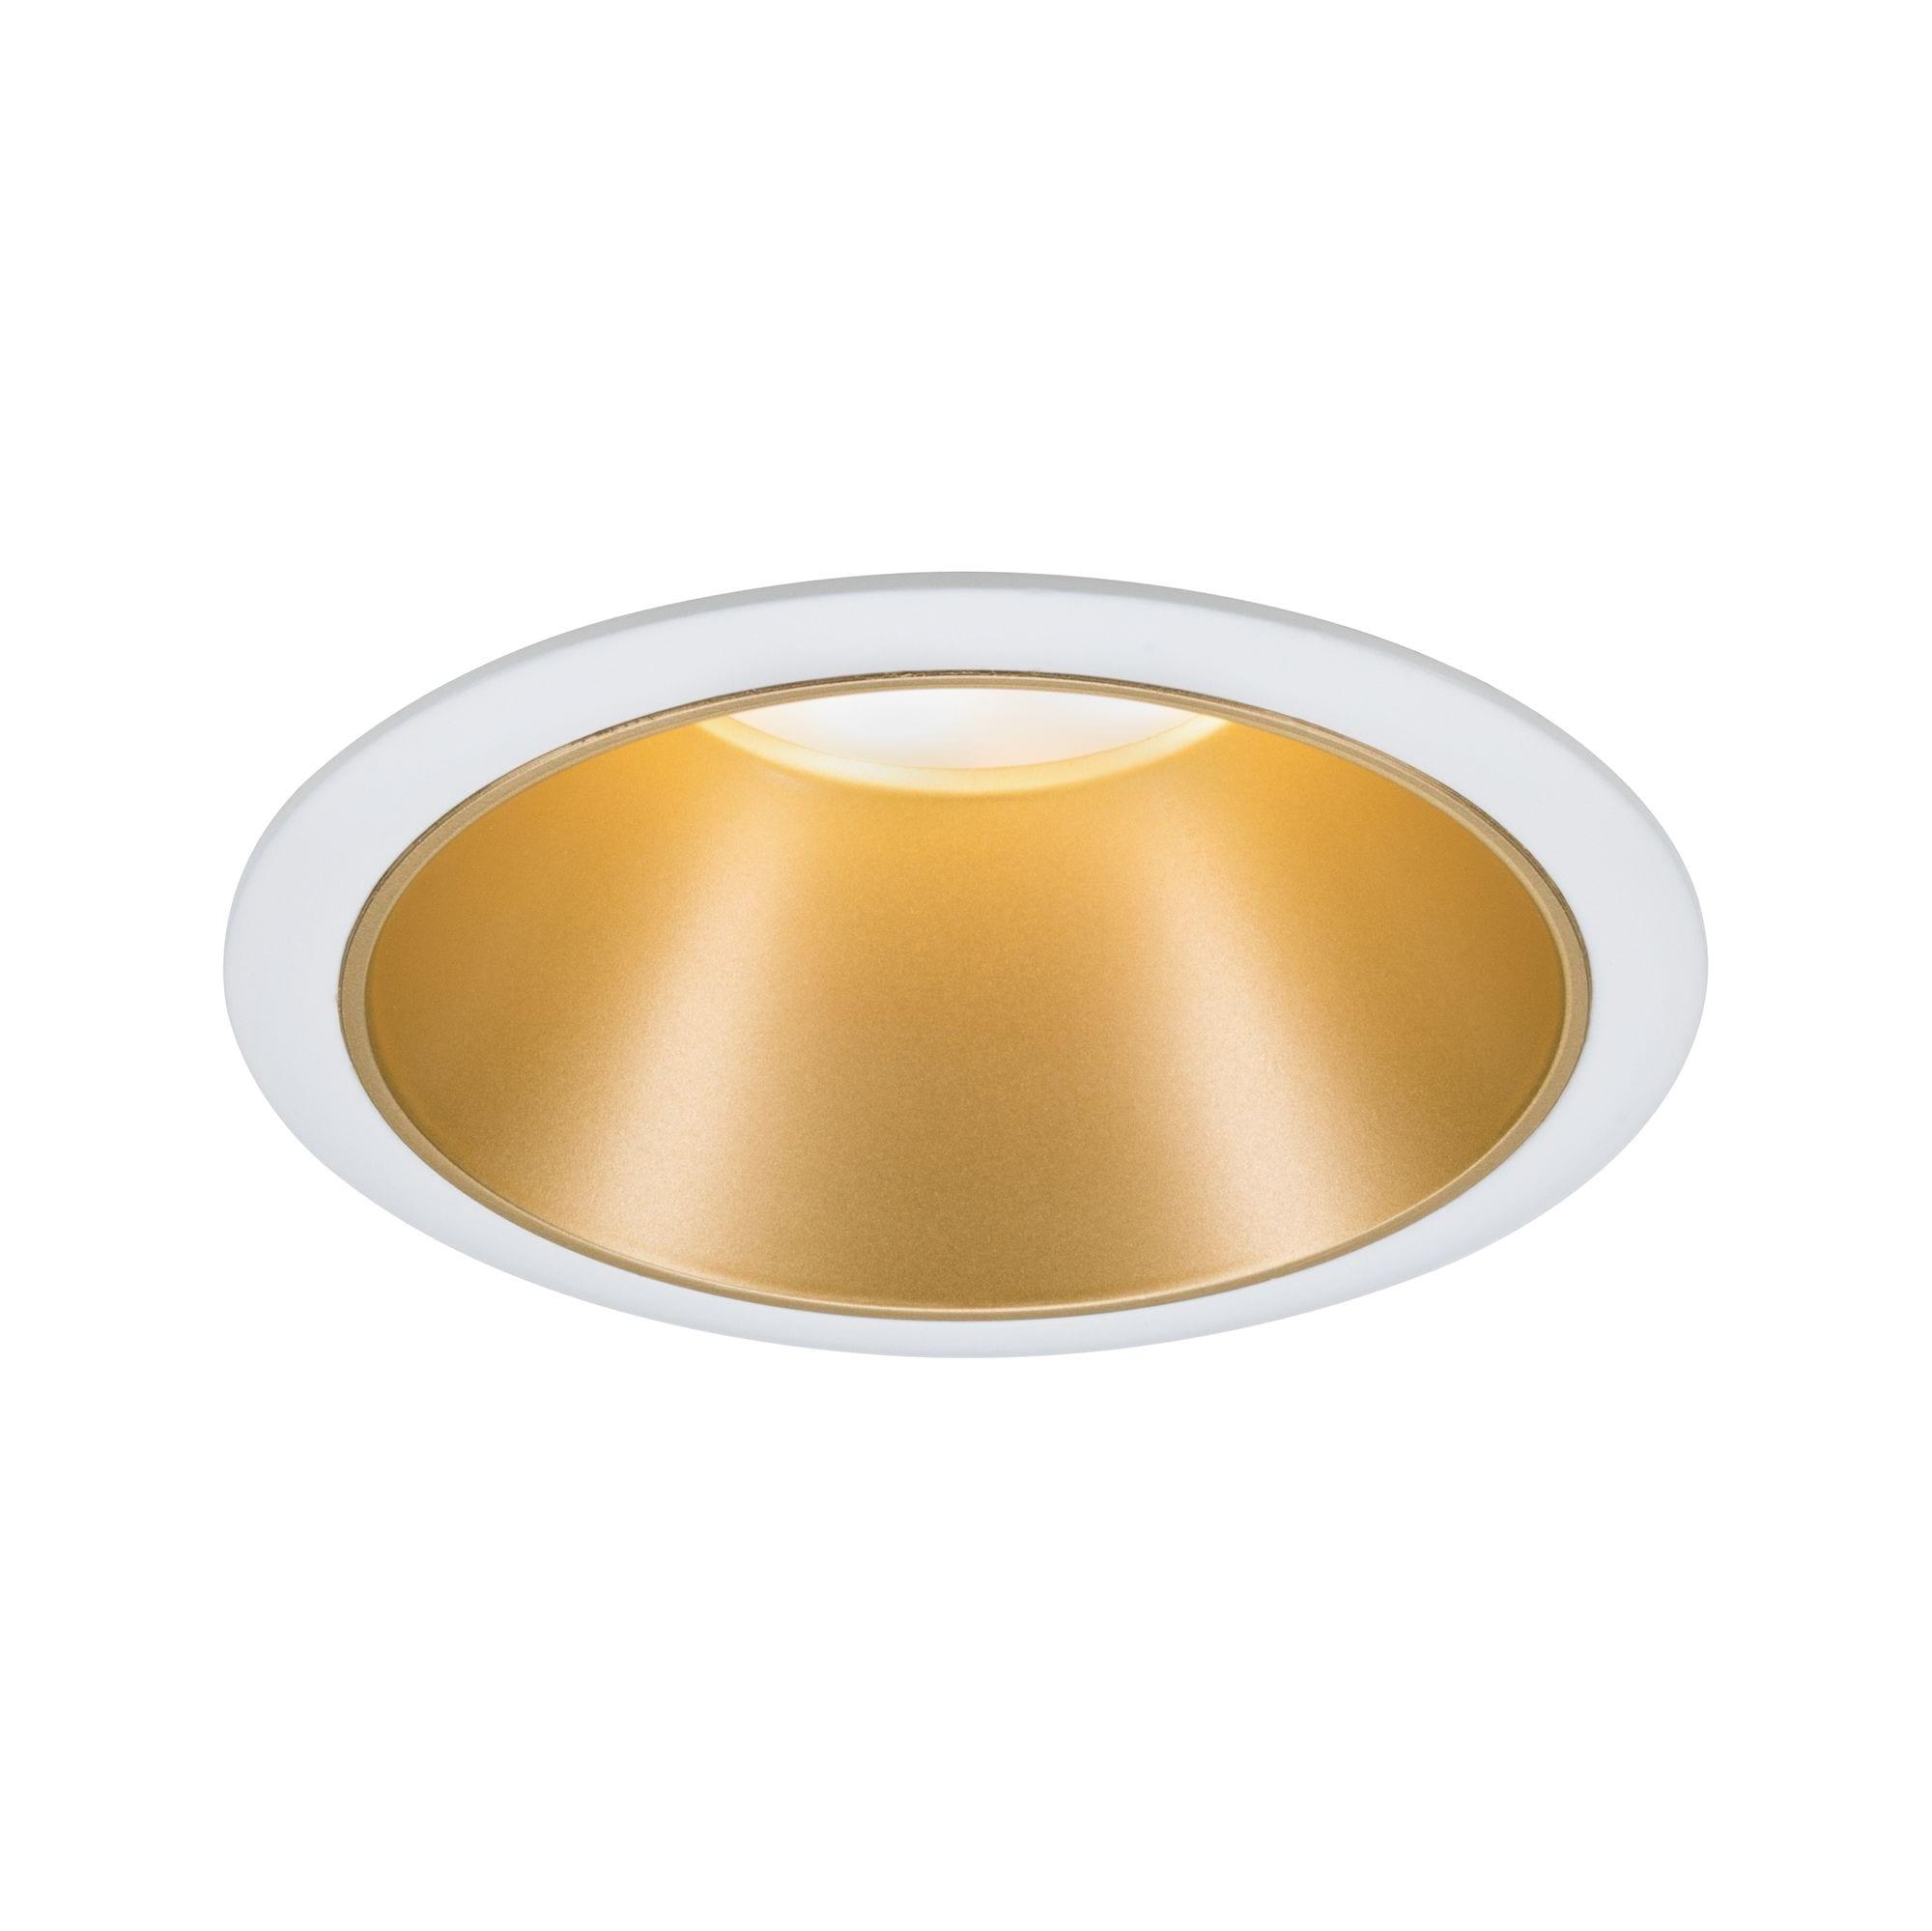 Paulmann LED Einbaustrahler Cole 6,5W Weiß/Gold matt 3-Stufen-dimmbar 2700K Warmweiß, Warmweiß